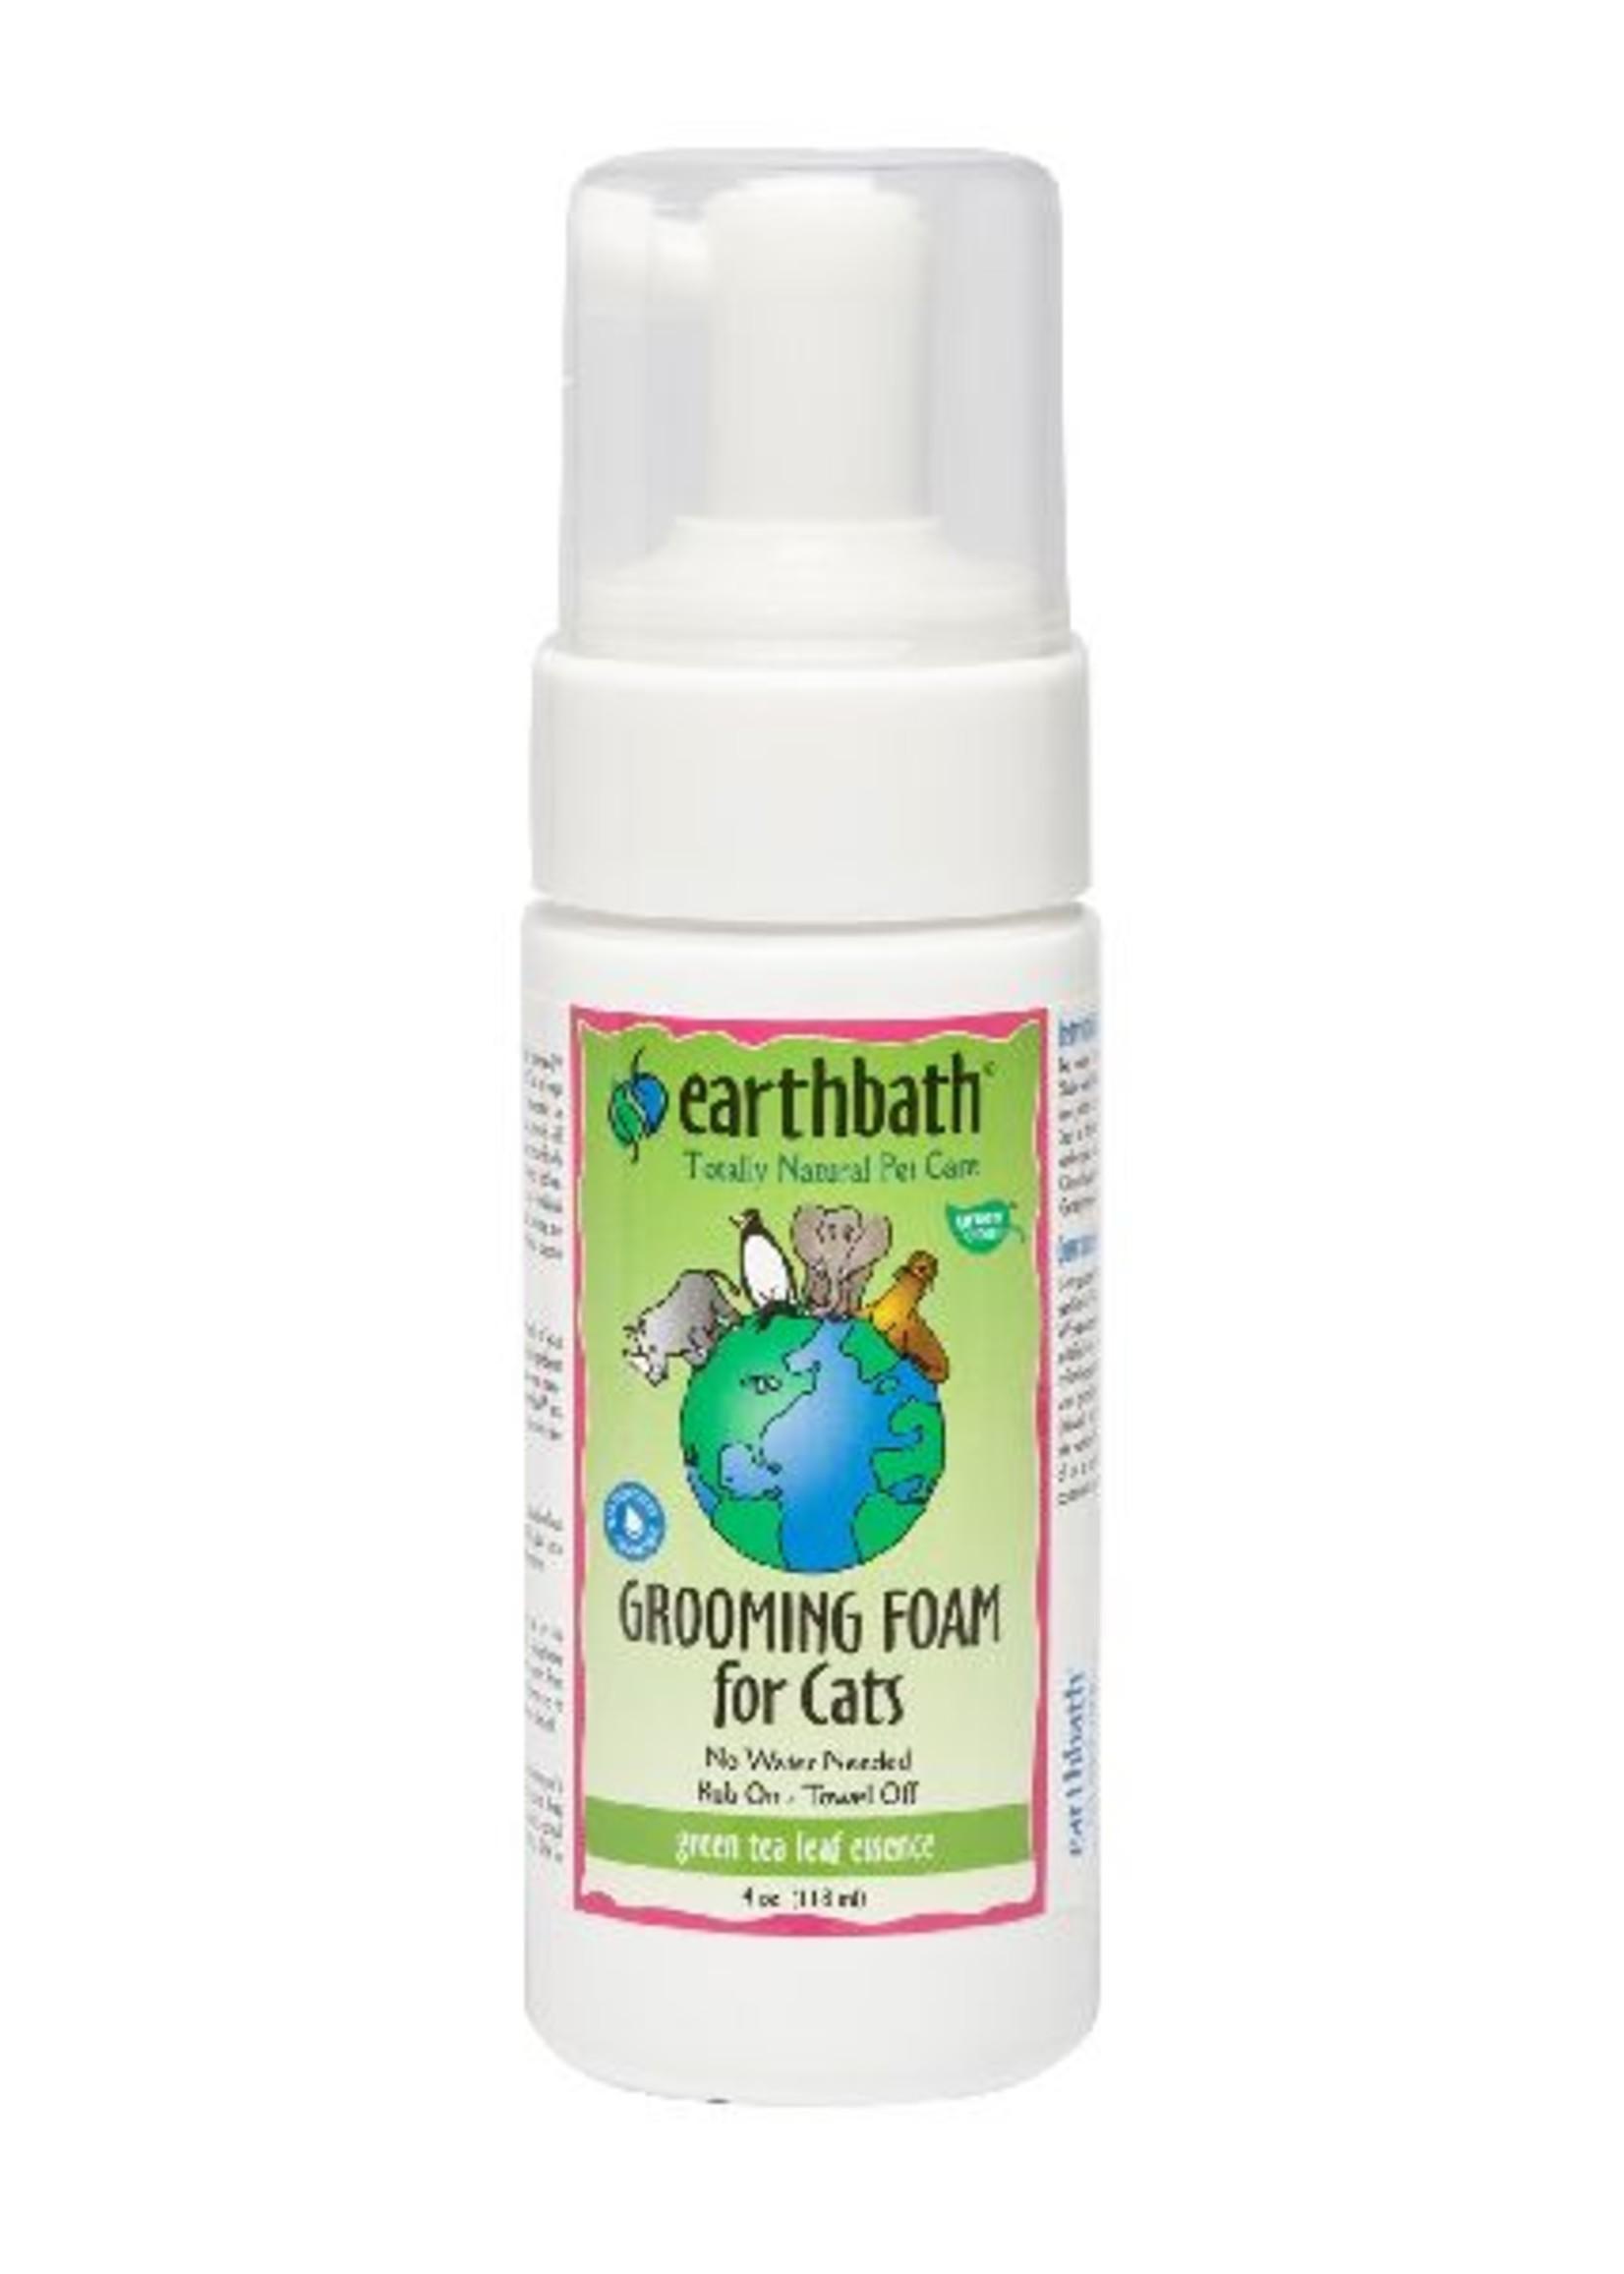 Earthbath EarthBath Green Tea Leaf Essence Grooming Foam for Cats 118ml